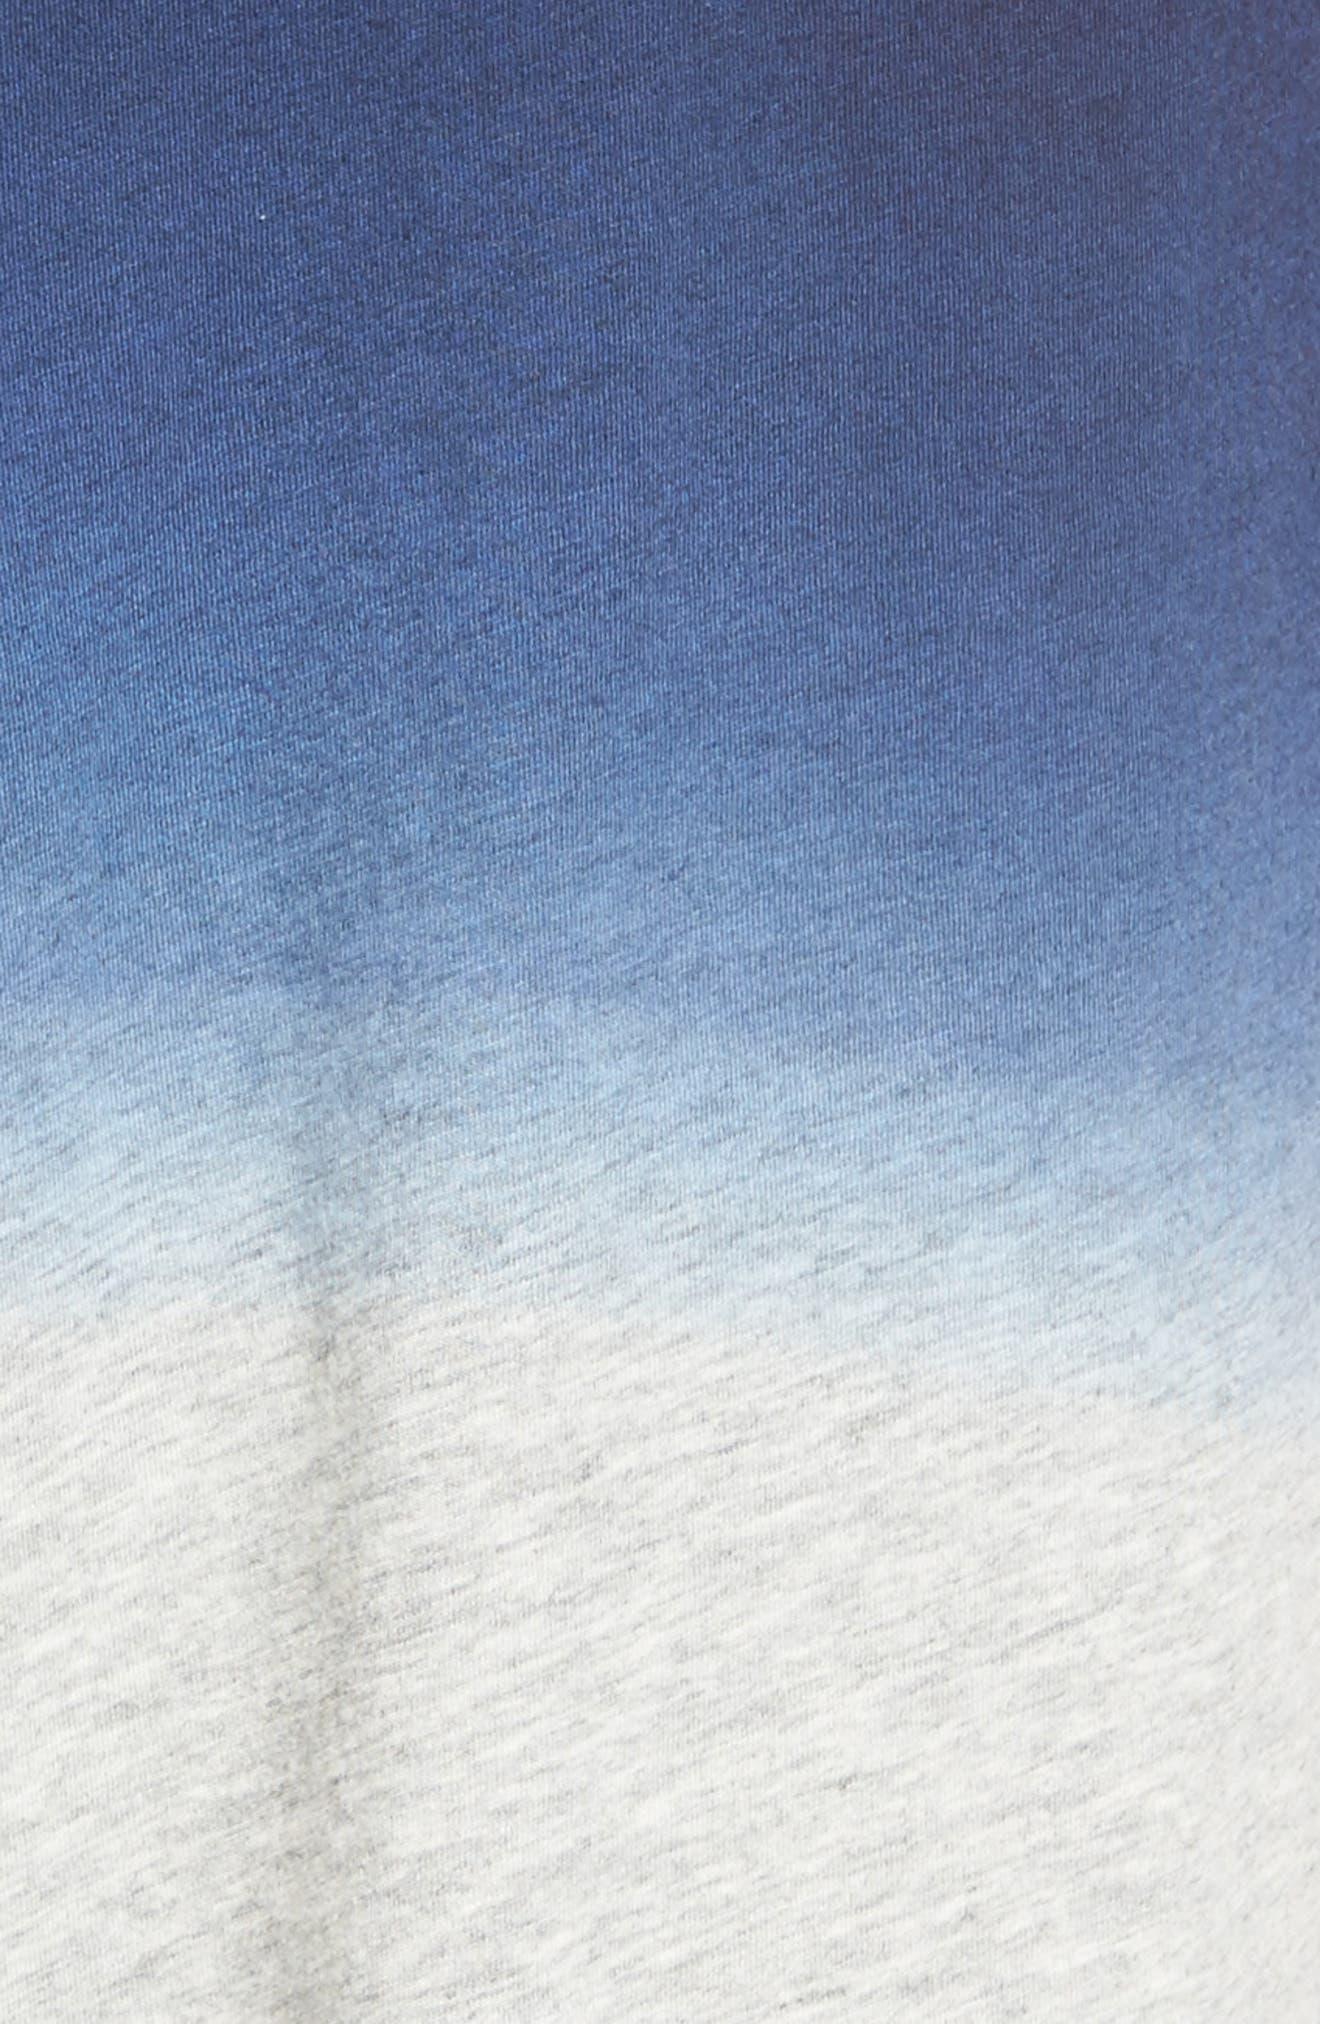 Dip Dye Lounge Shorts,                             Alternate thumbnail 5, color,                             410